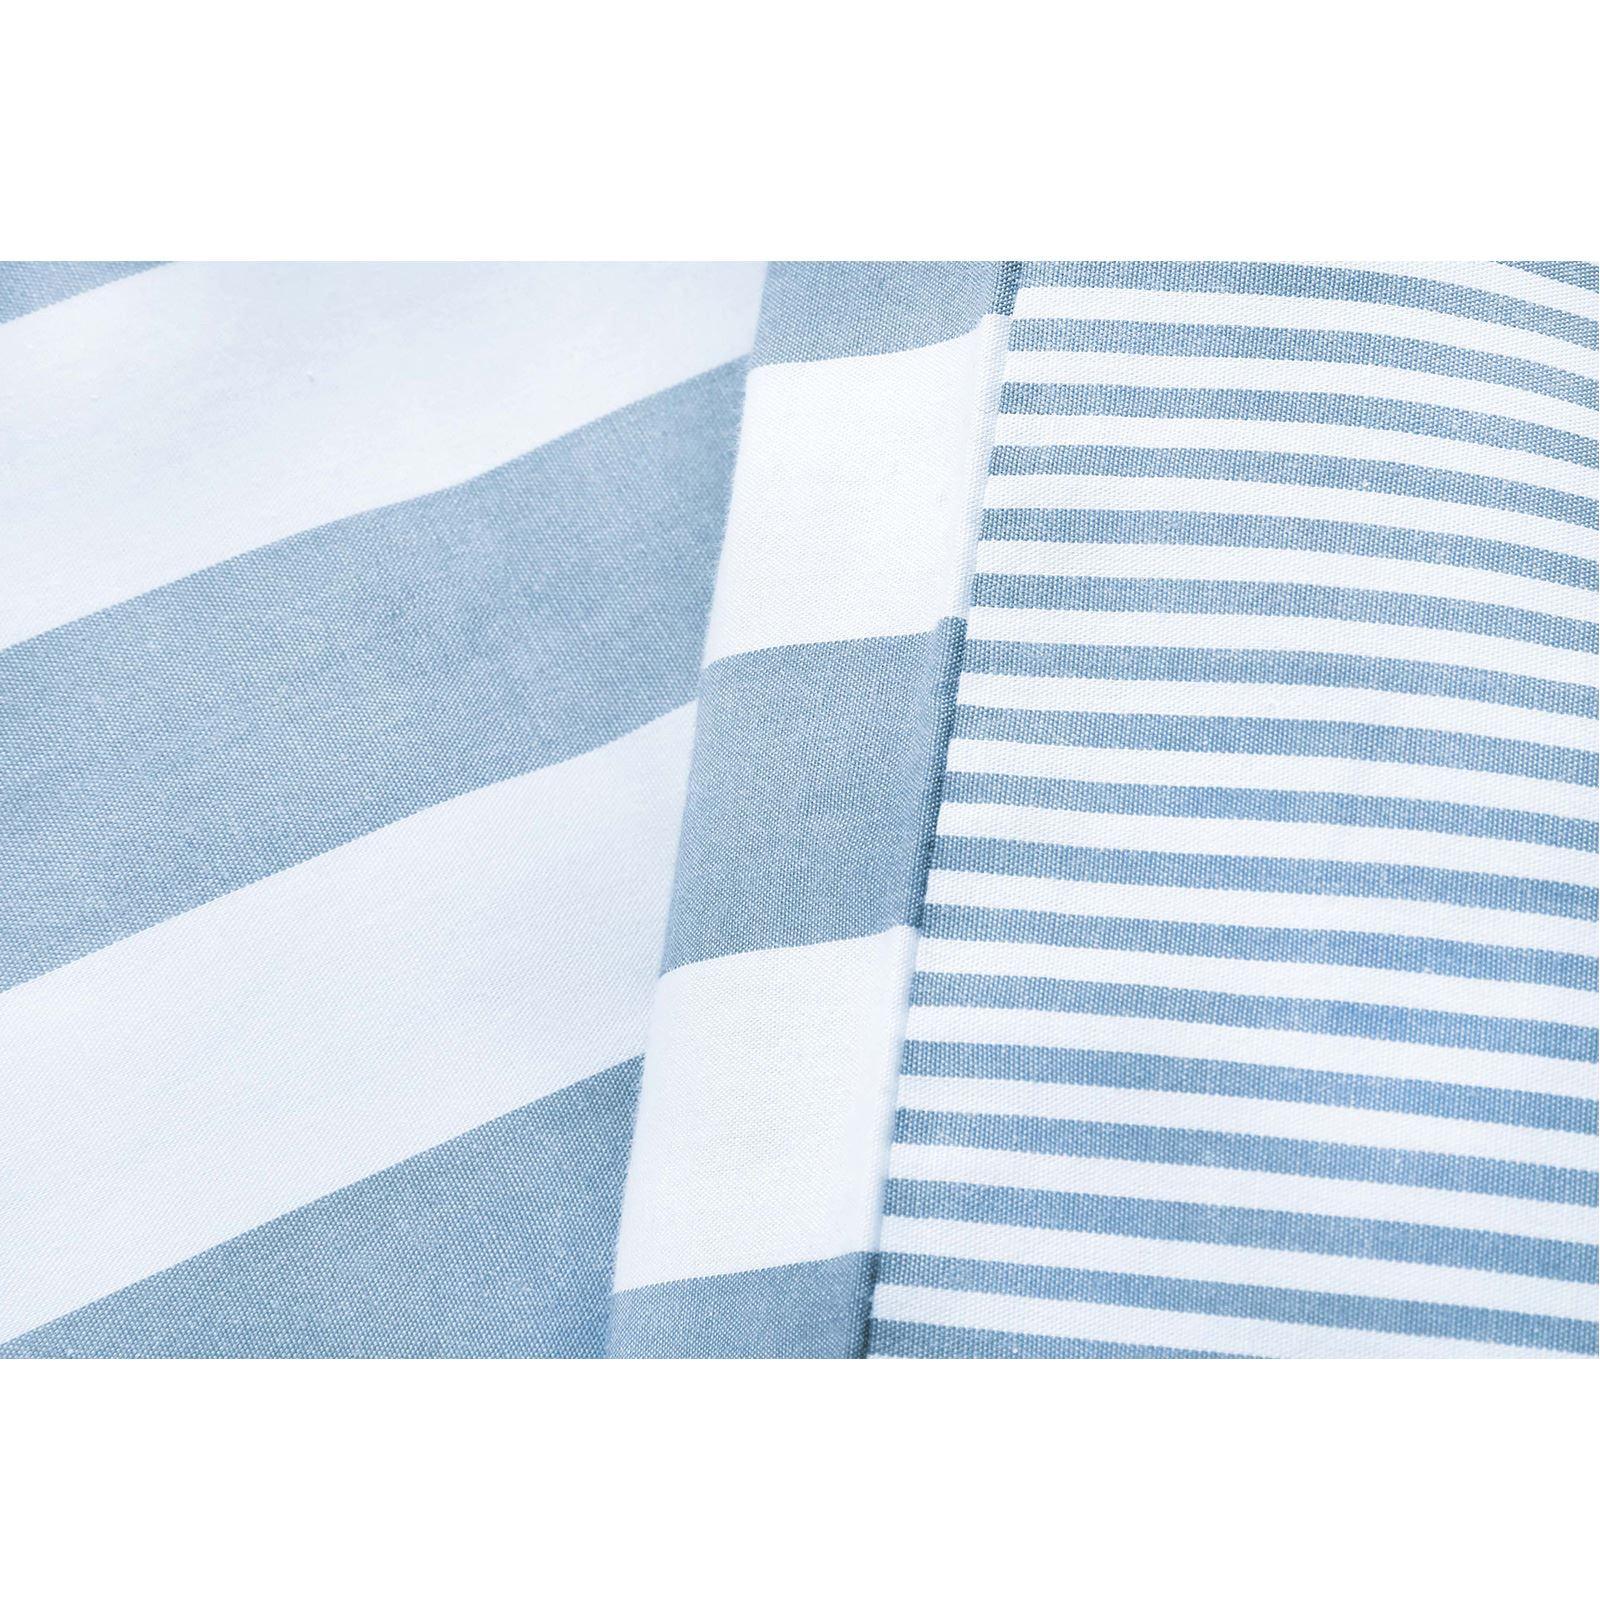 Rayas-Verticales-Tejido-100-algodon-T200-Cubierta-Edredon-Reversible-del-lecho-del miniatura 7